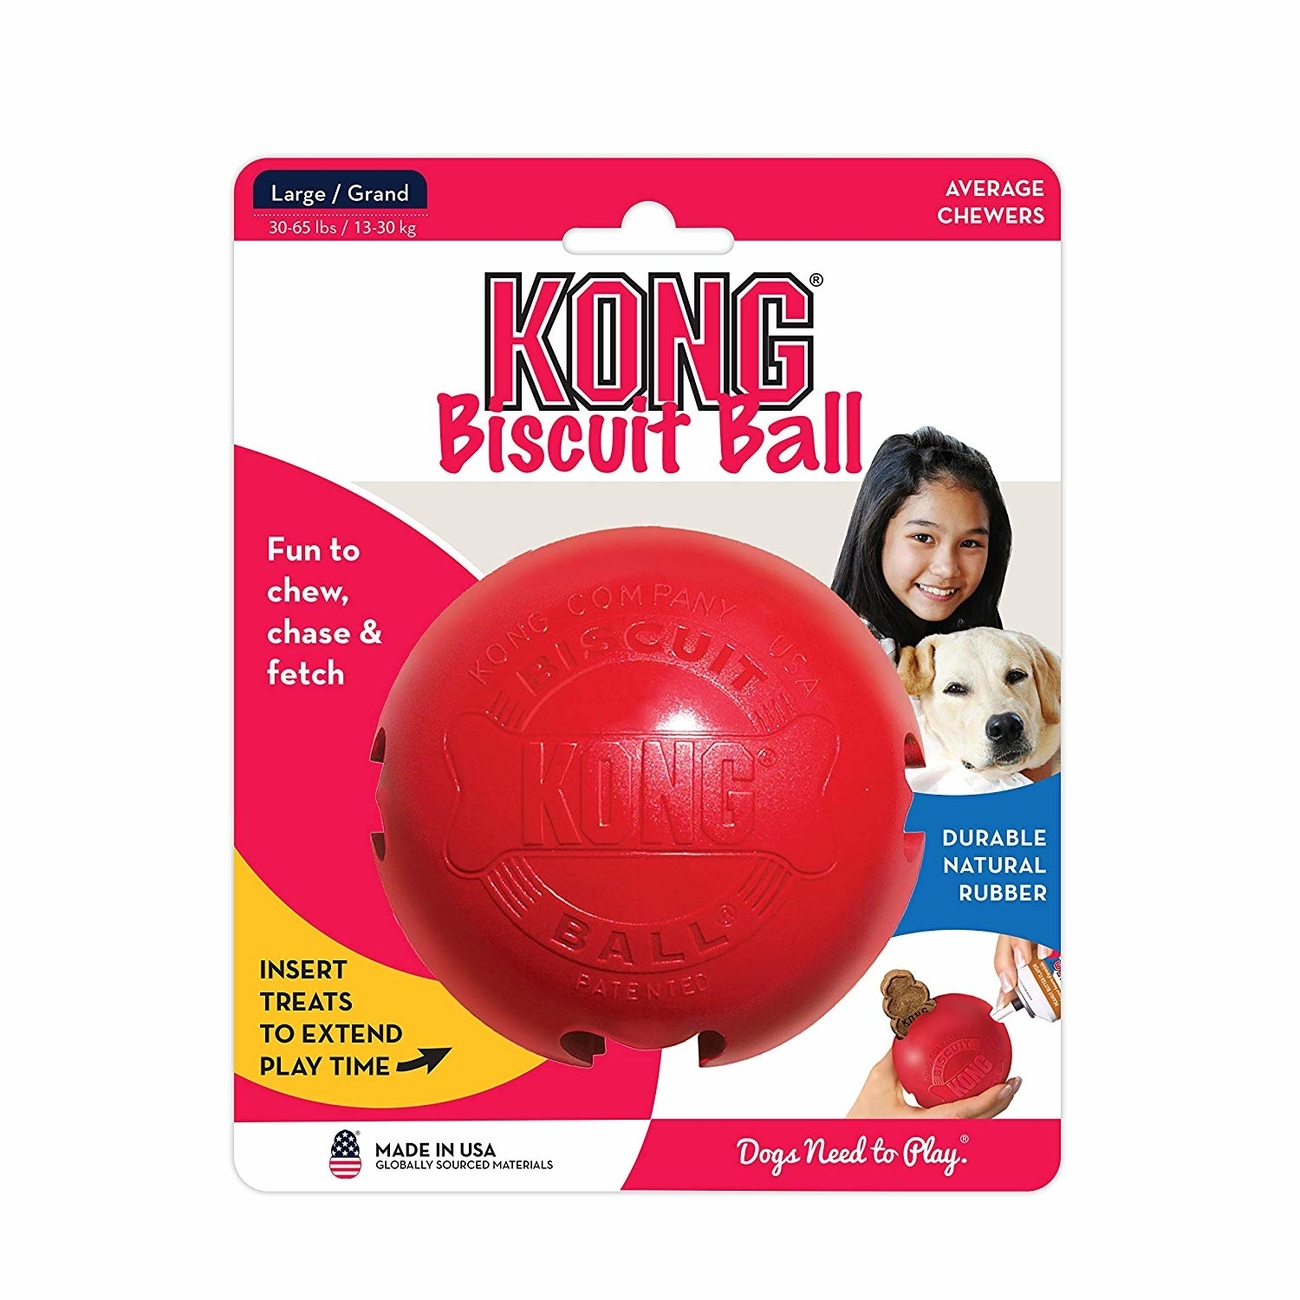 KONG Biscuit Ball Hundespielzeug, Bild 3